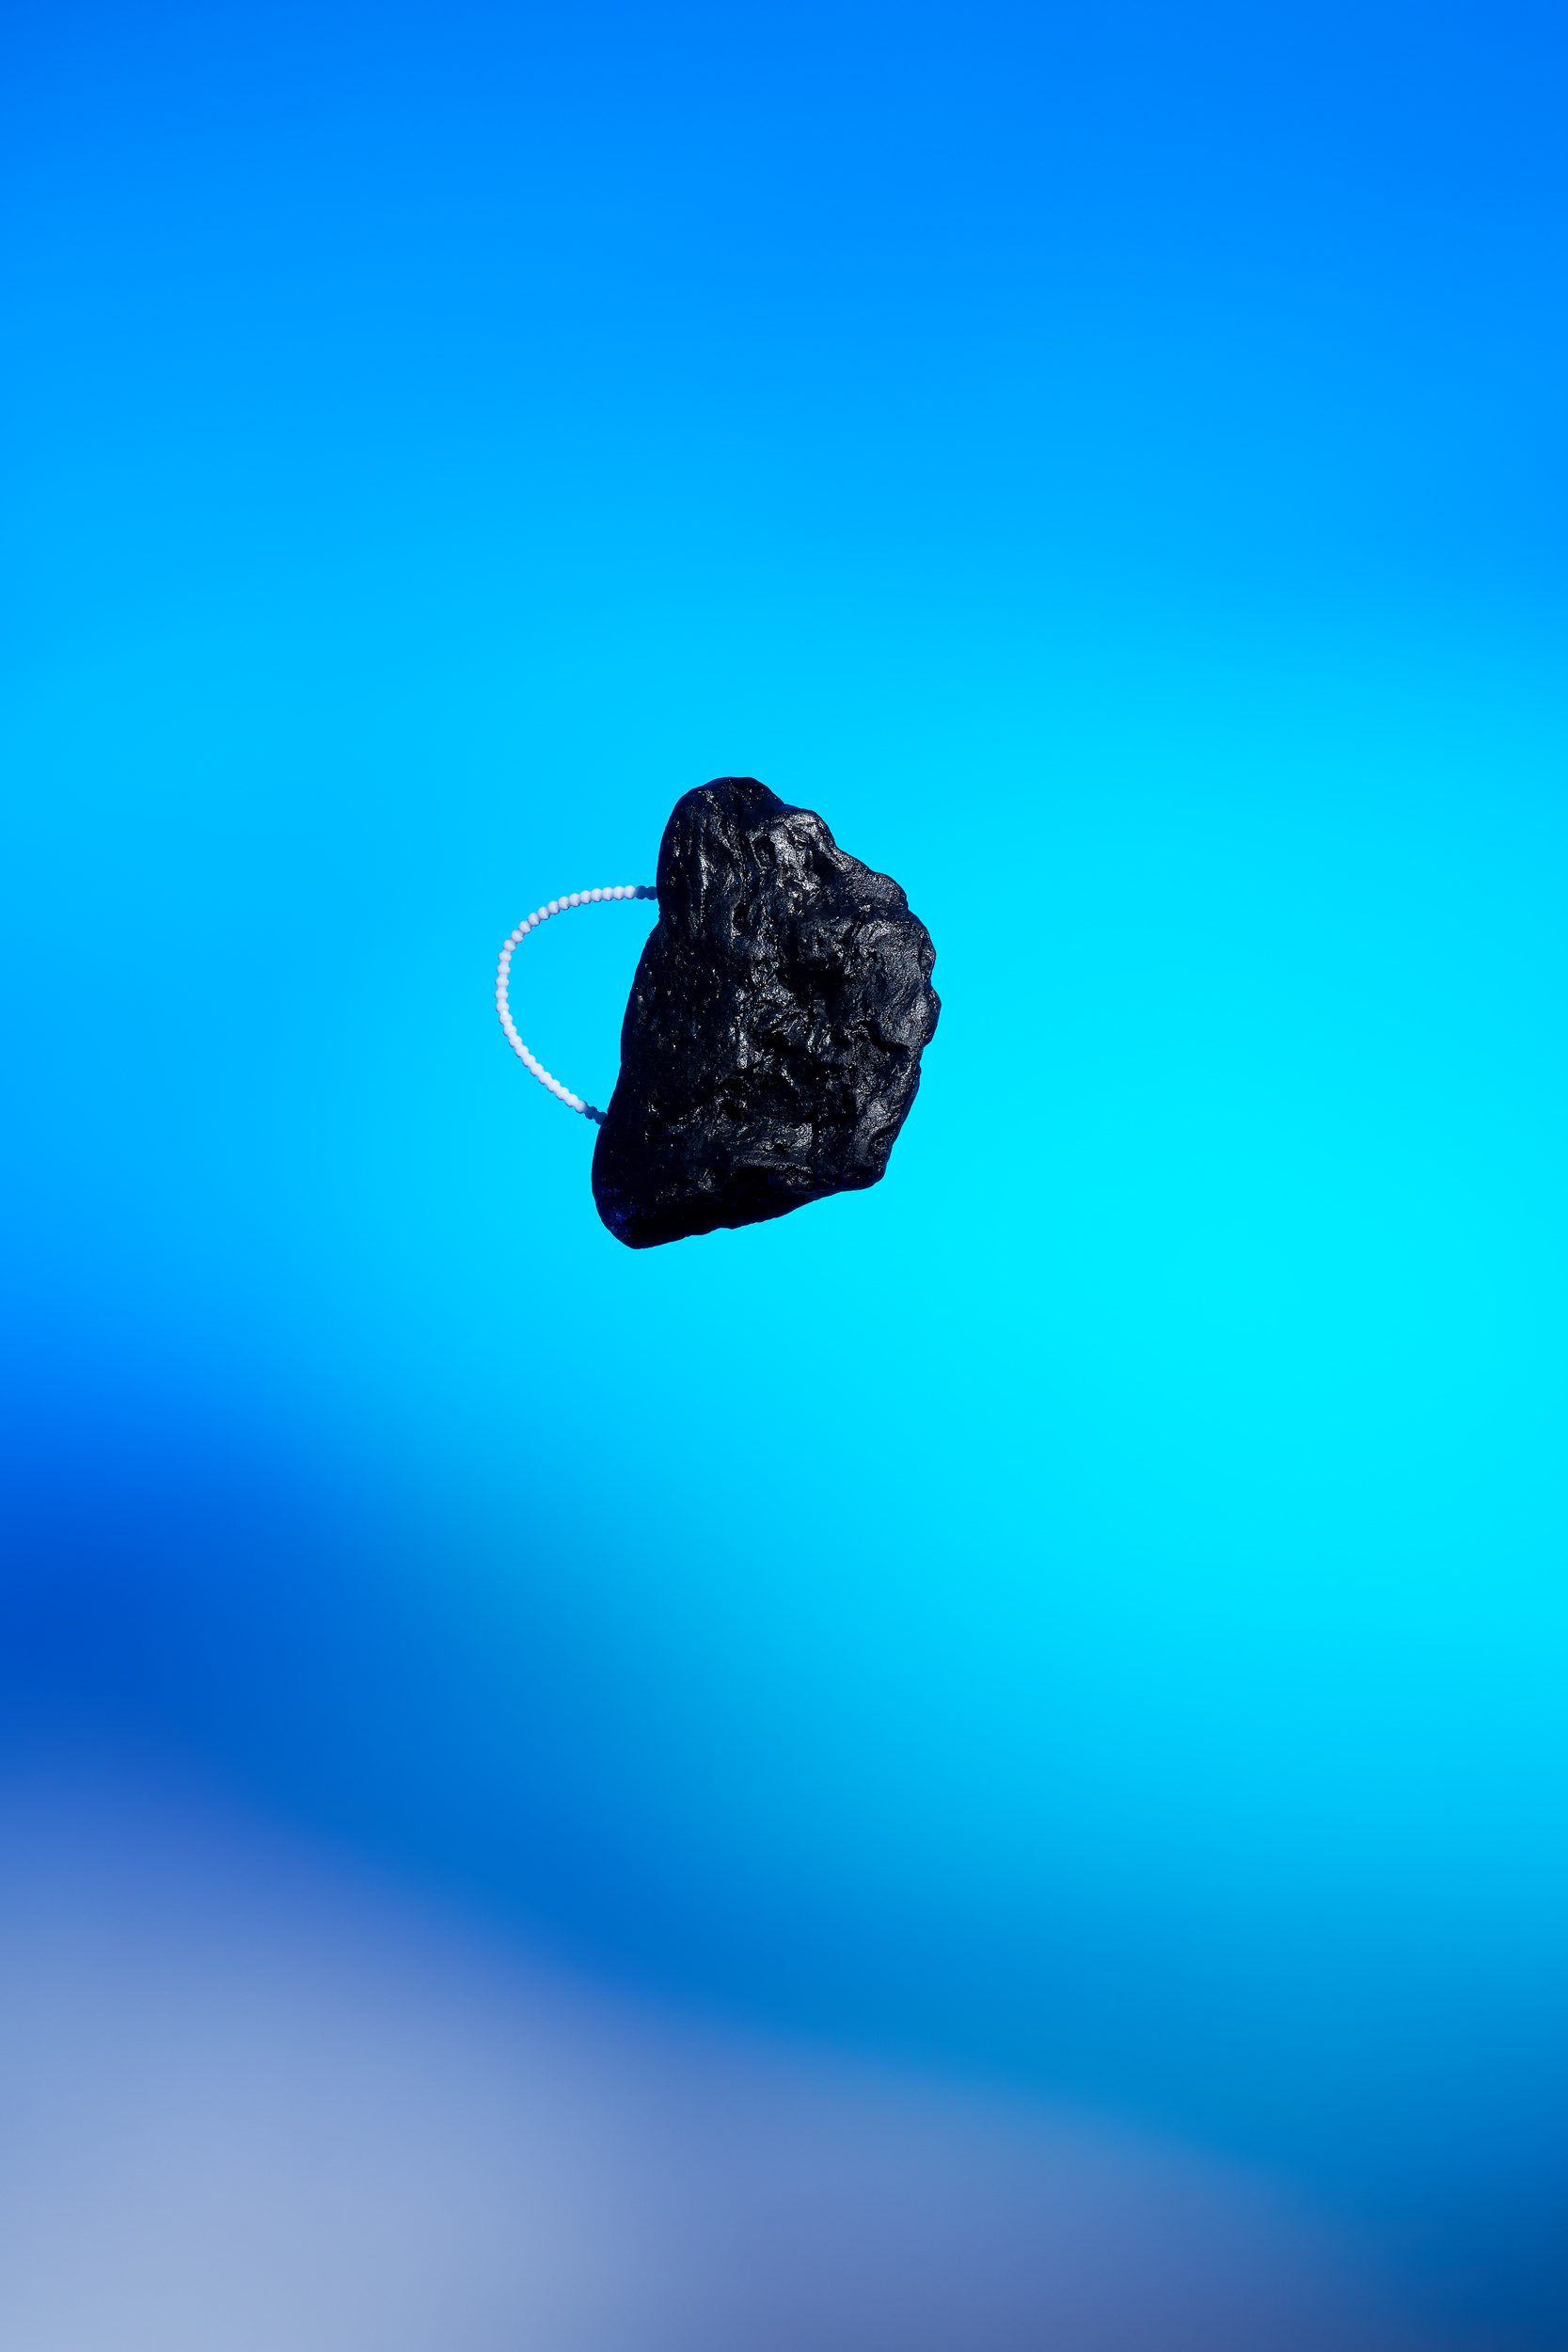 The-Rock-series-abstract_art-concept-still_life-photography-02-SH_1©Aivaras_Simonis